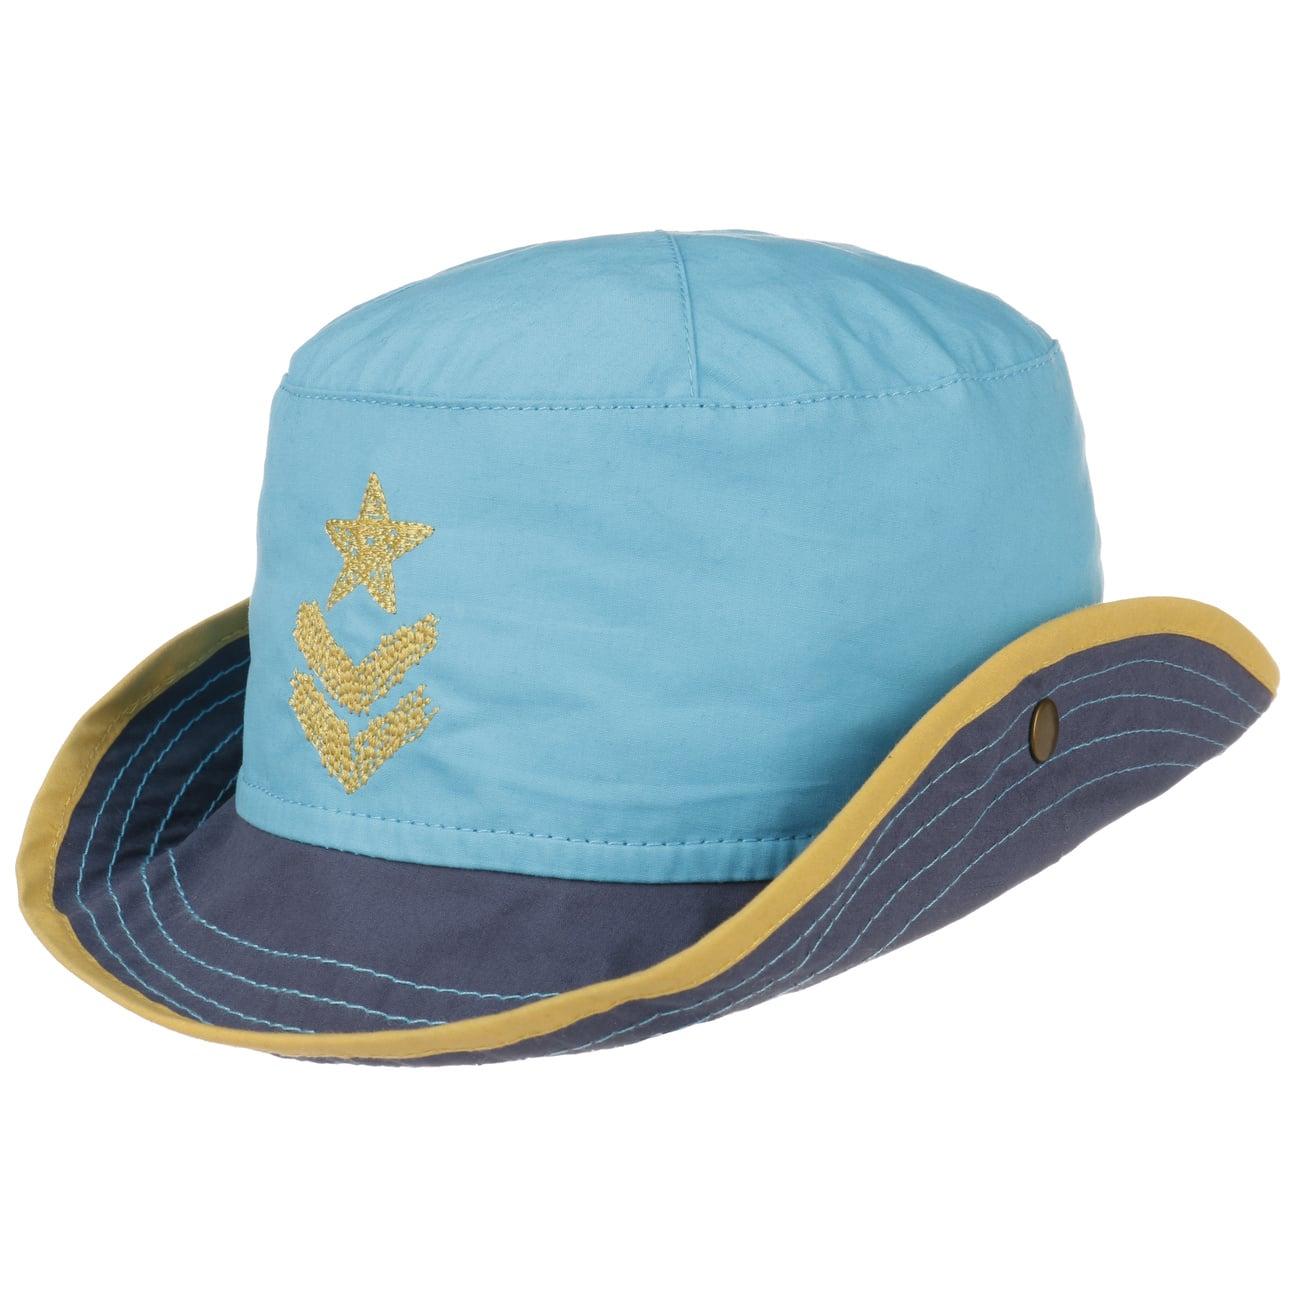 Sombrero de Ni?o Luca by Sterntaler